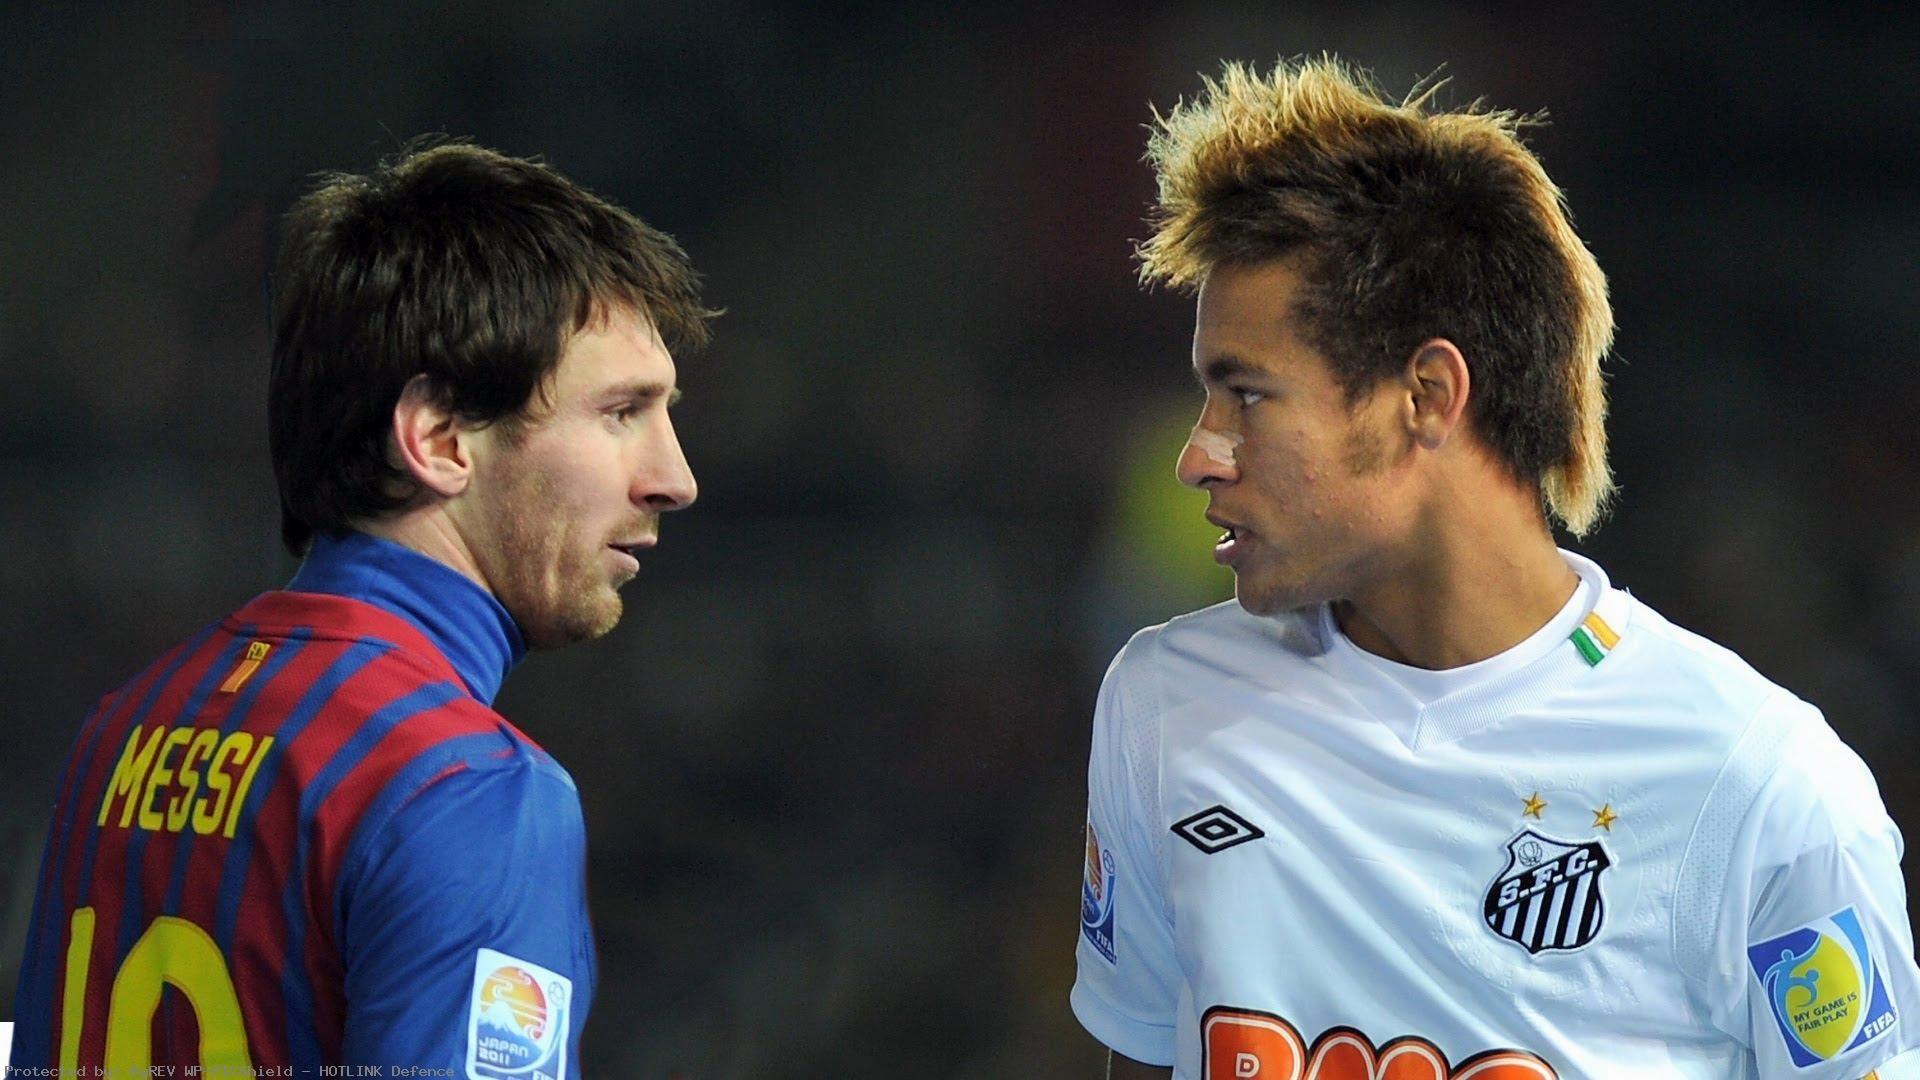 Neymar-Vs-Messi-Xpx-1920x1080px-wallpaper-wp60010379